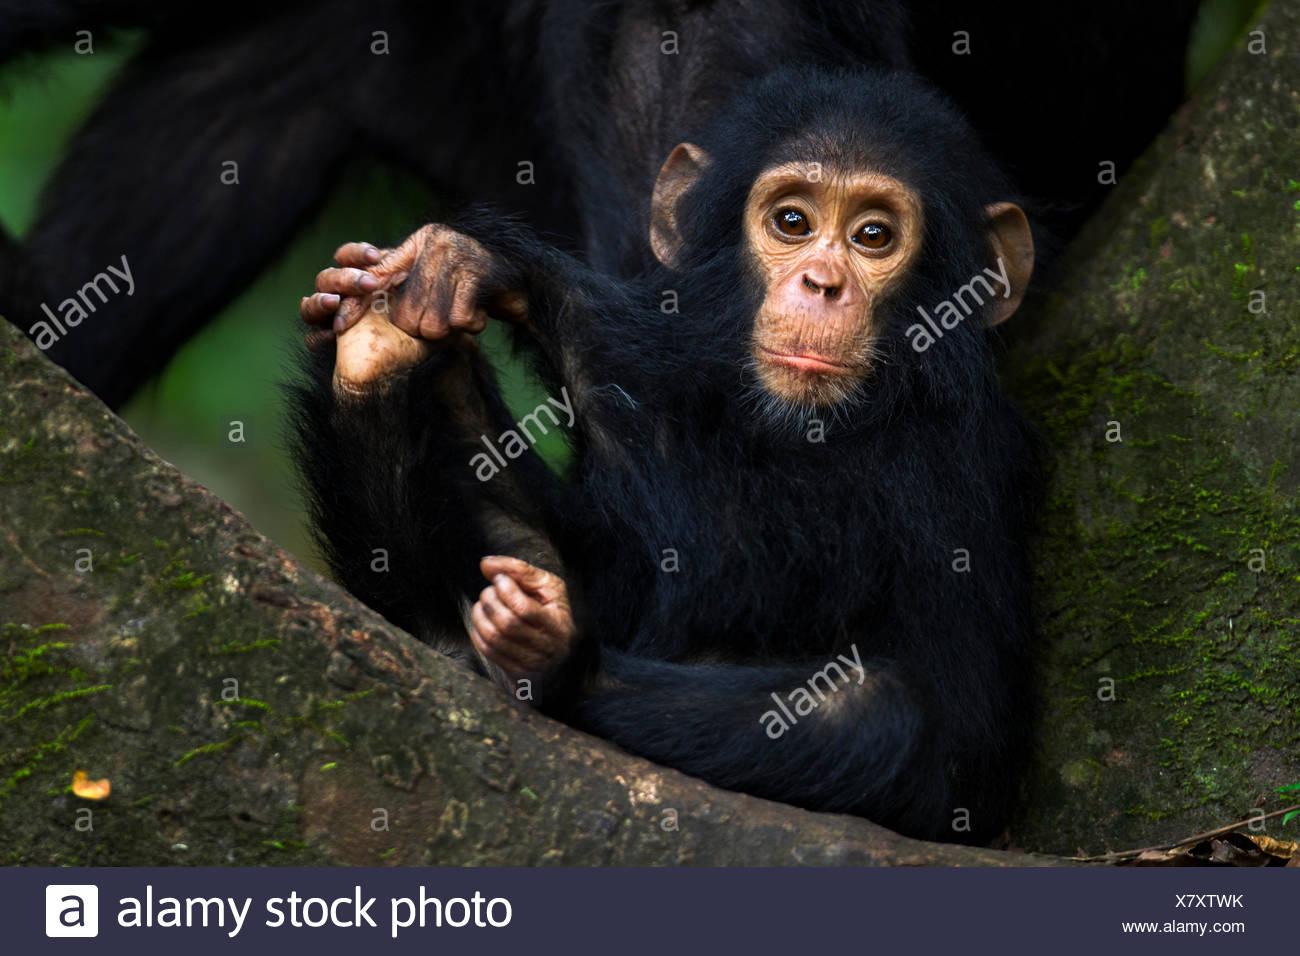 Eastern chimpanzee (Pan troglodytes schweinfurtheii) infant male 'Gizmo' aged 1-2 years sitting portrait. Gombe National Park, Tanzania. - Stock Image